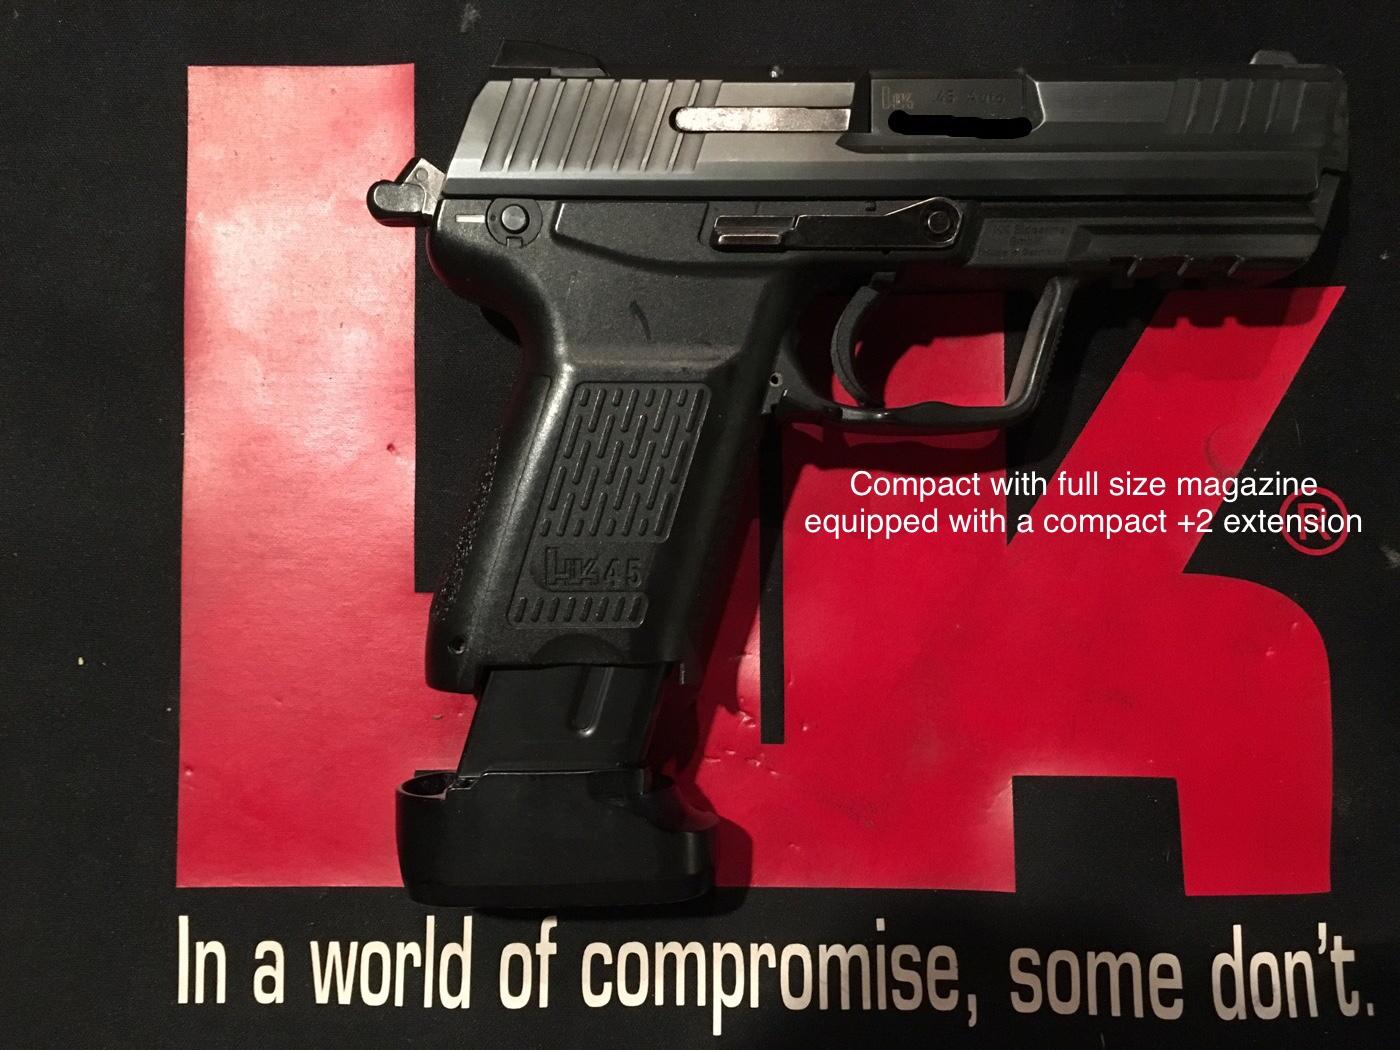 My experience with HK45/HK45C magazine extensions-9b7965ae-7b65-4d5d-b637-cc5321a18ac9.jpeg